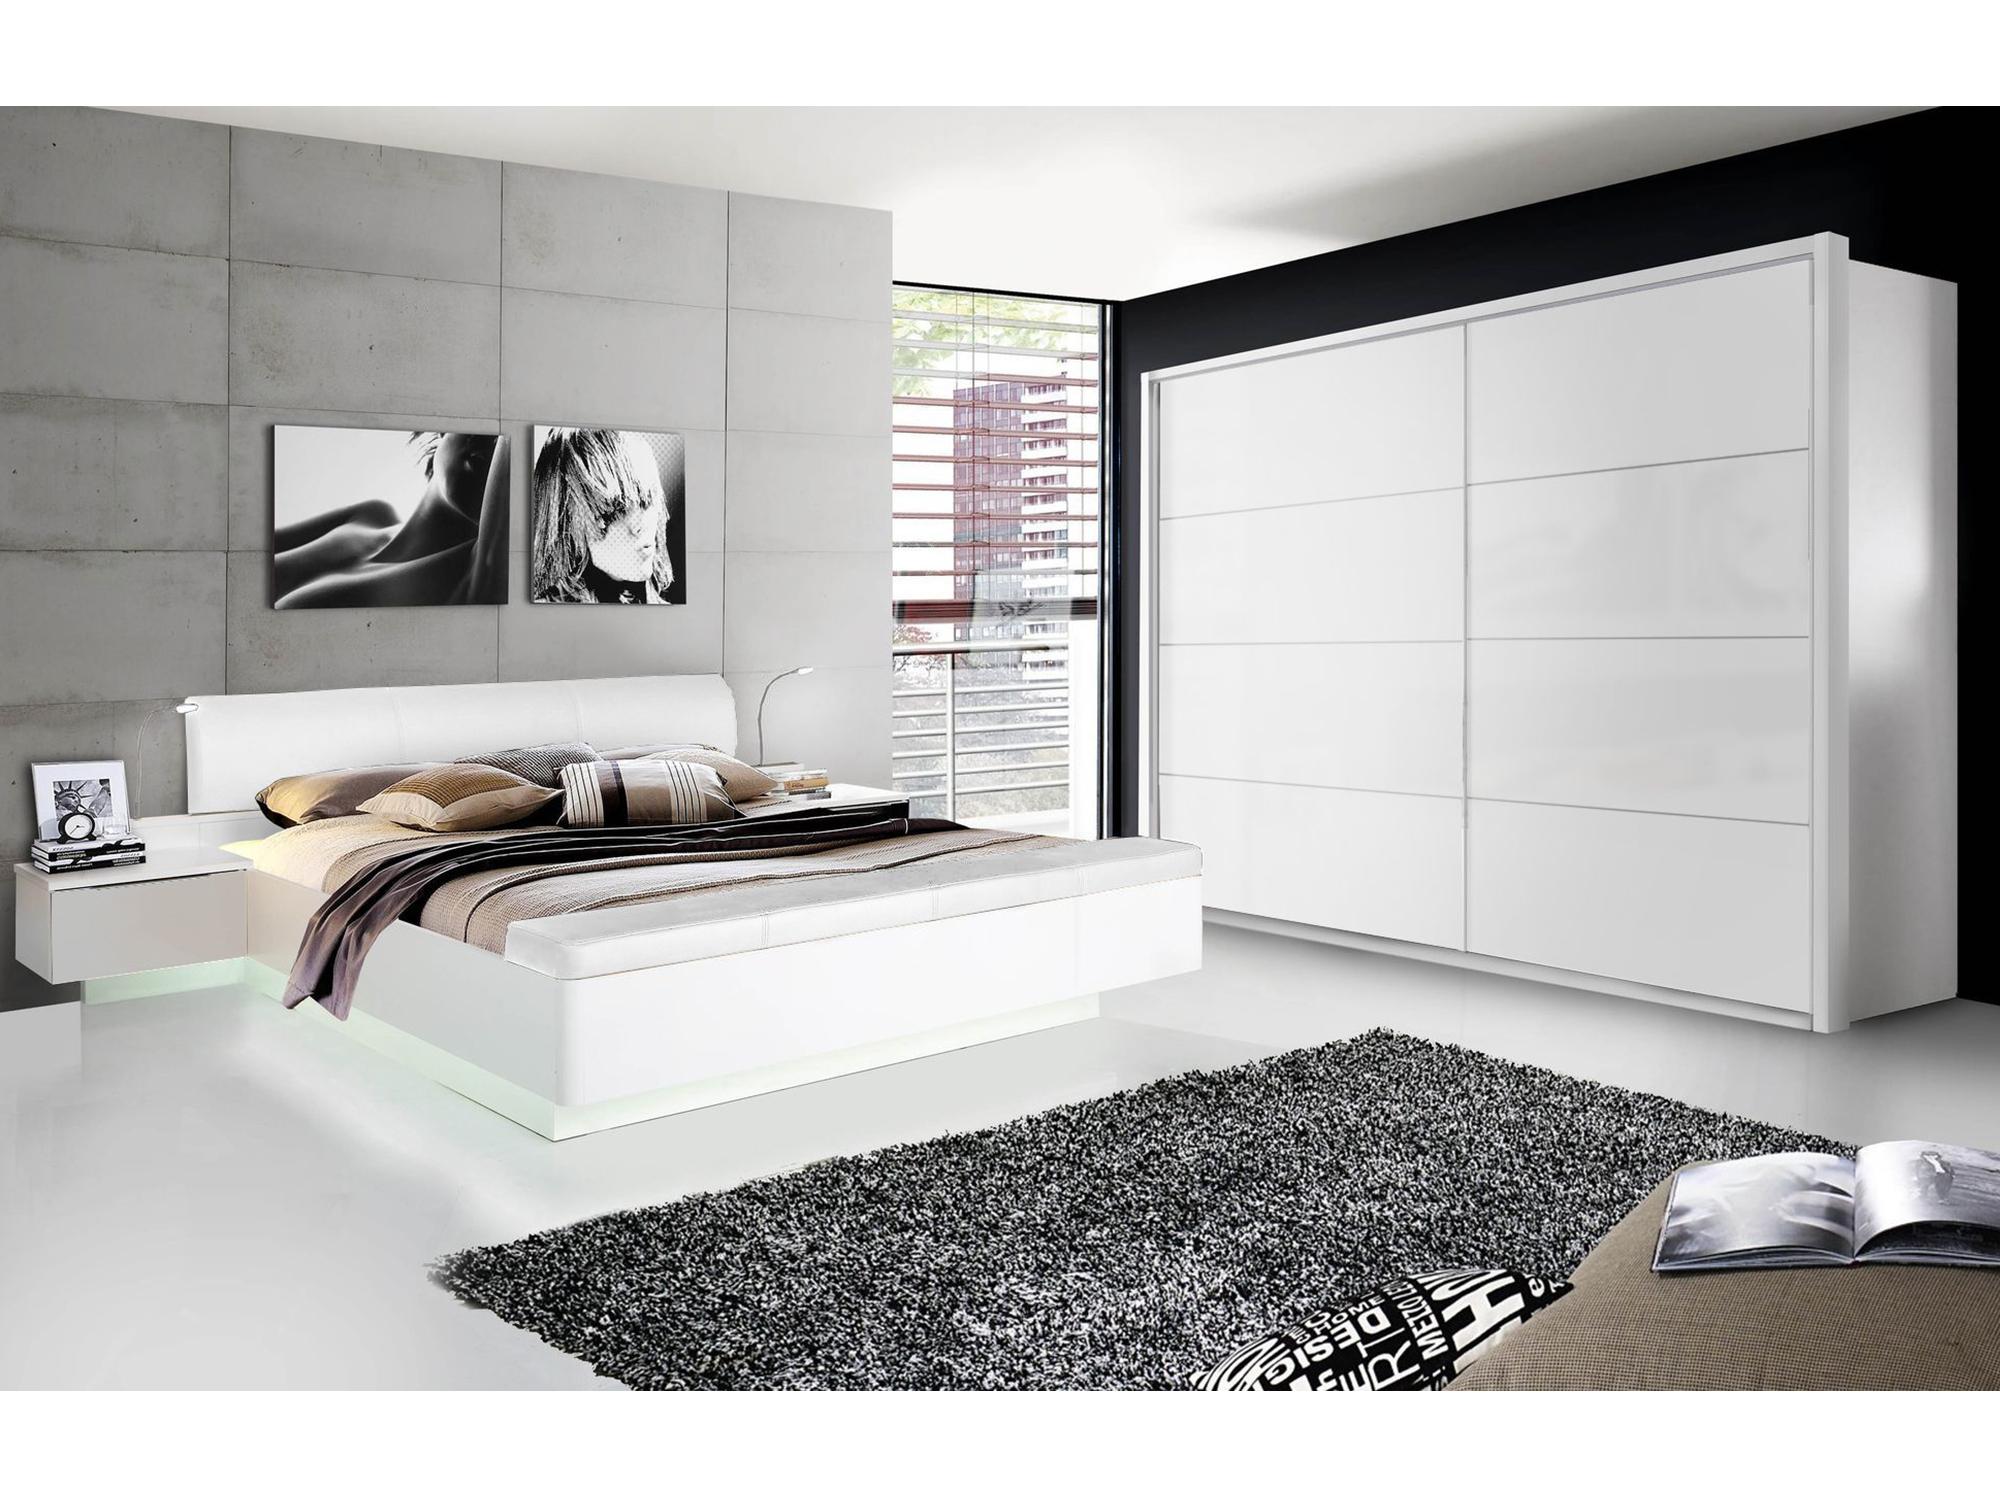 Silent komplett schlafzimmer weiss hochglanz 4 teilig 200 cm - Schlafzimmer hochglanz ...